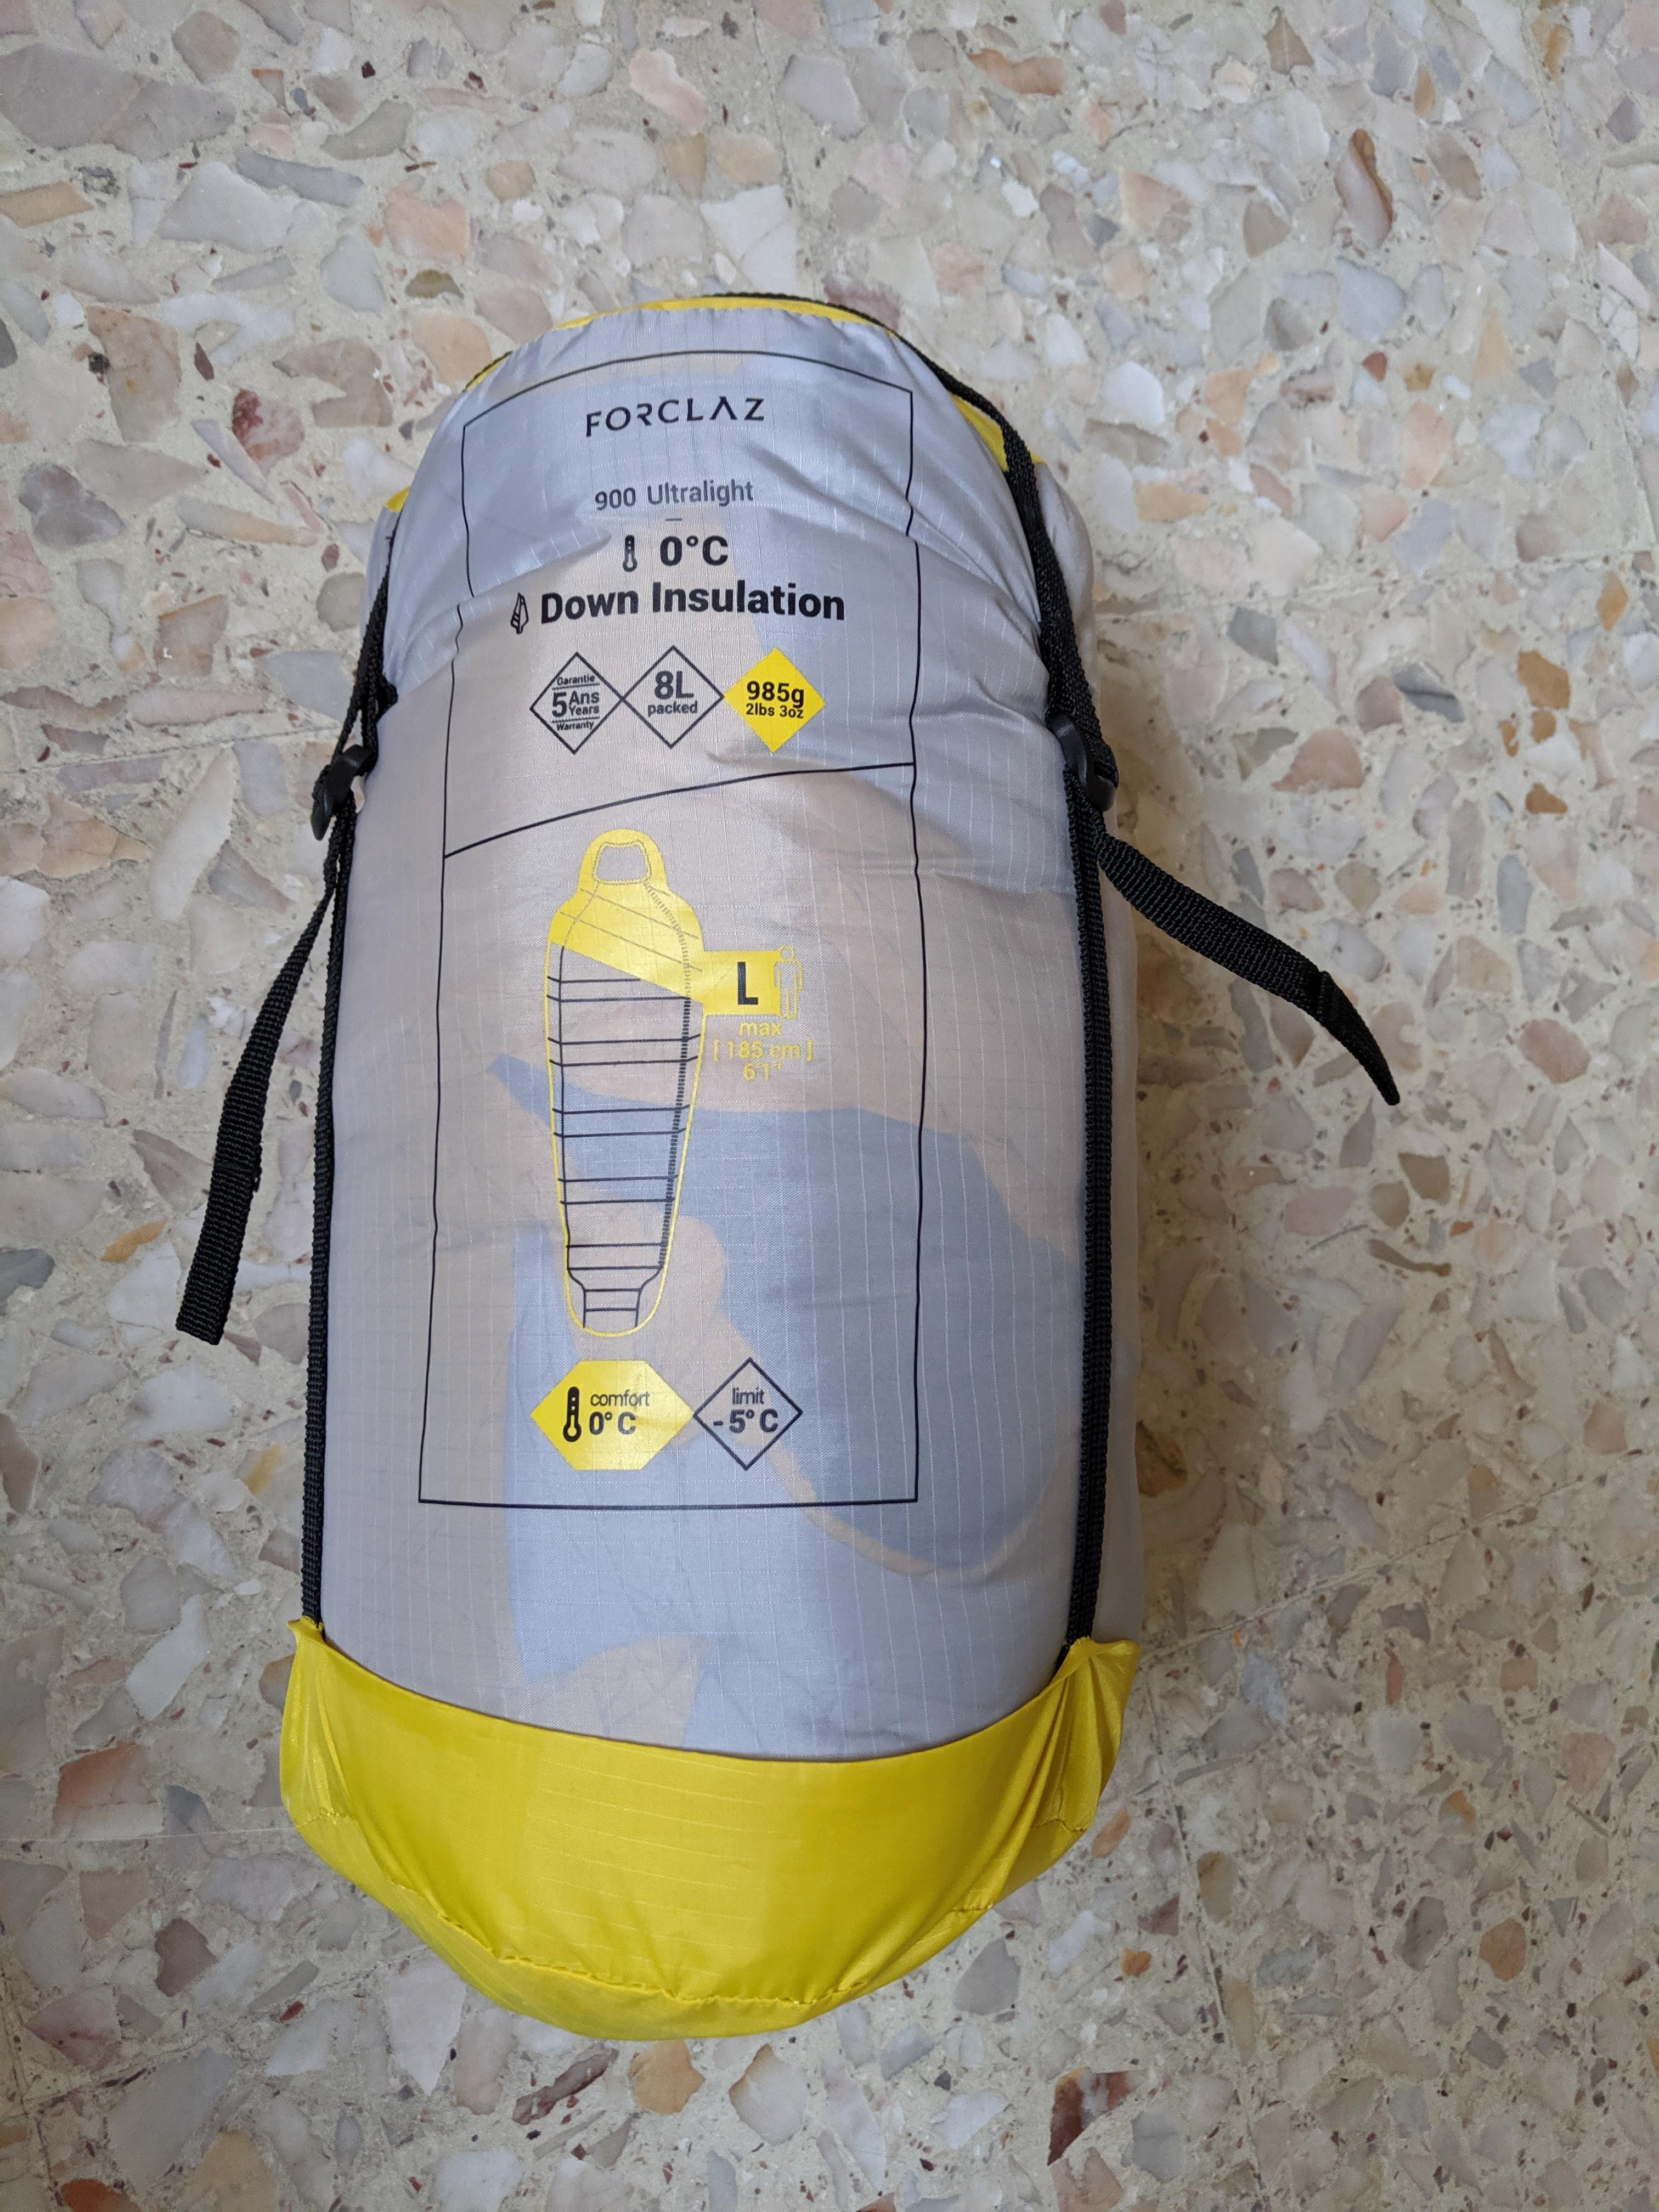 Forclaz Down 900 Ultralight 0 Degrees Sleeping Bag